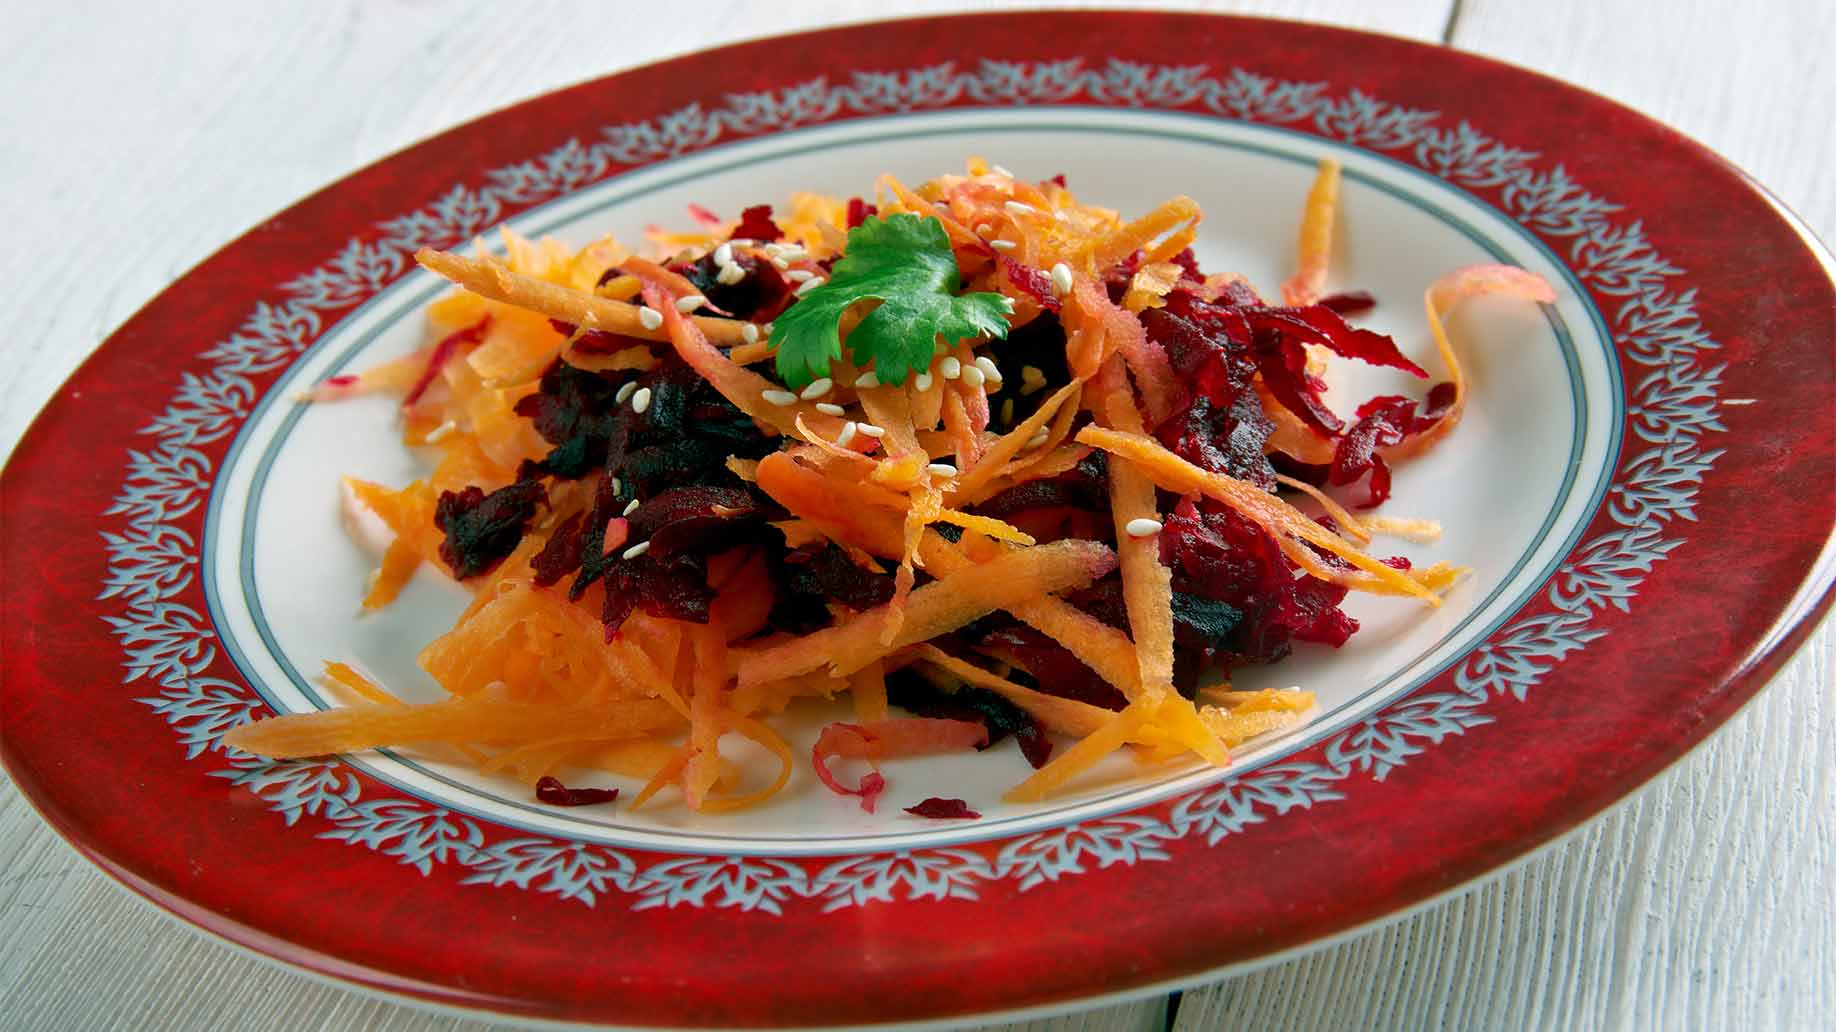 kidney cleanse diy detox carrots beets dandelion salad remove toxins naturally